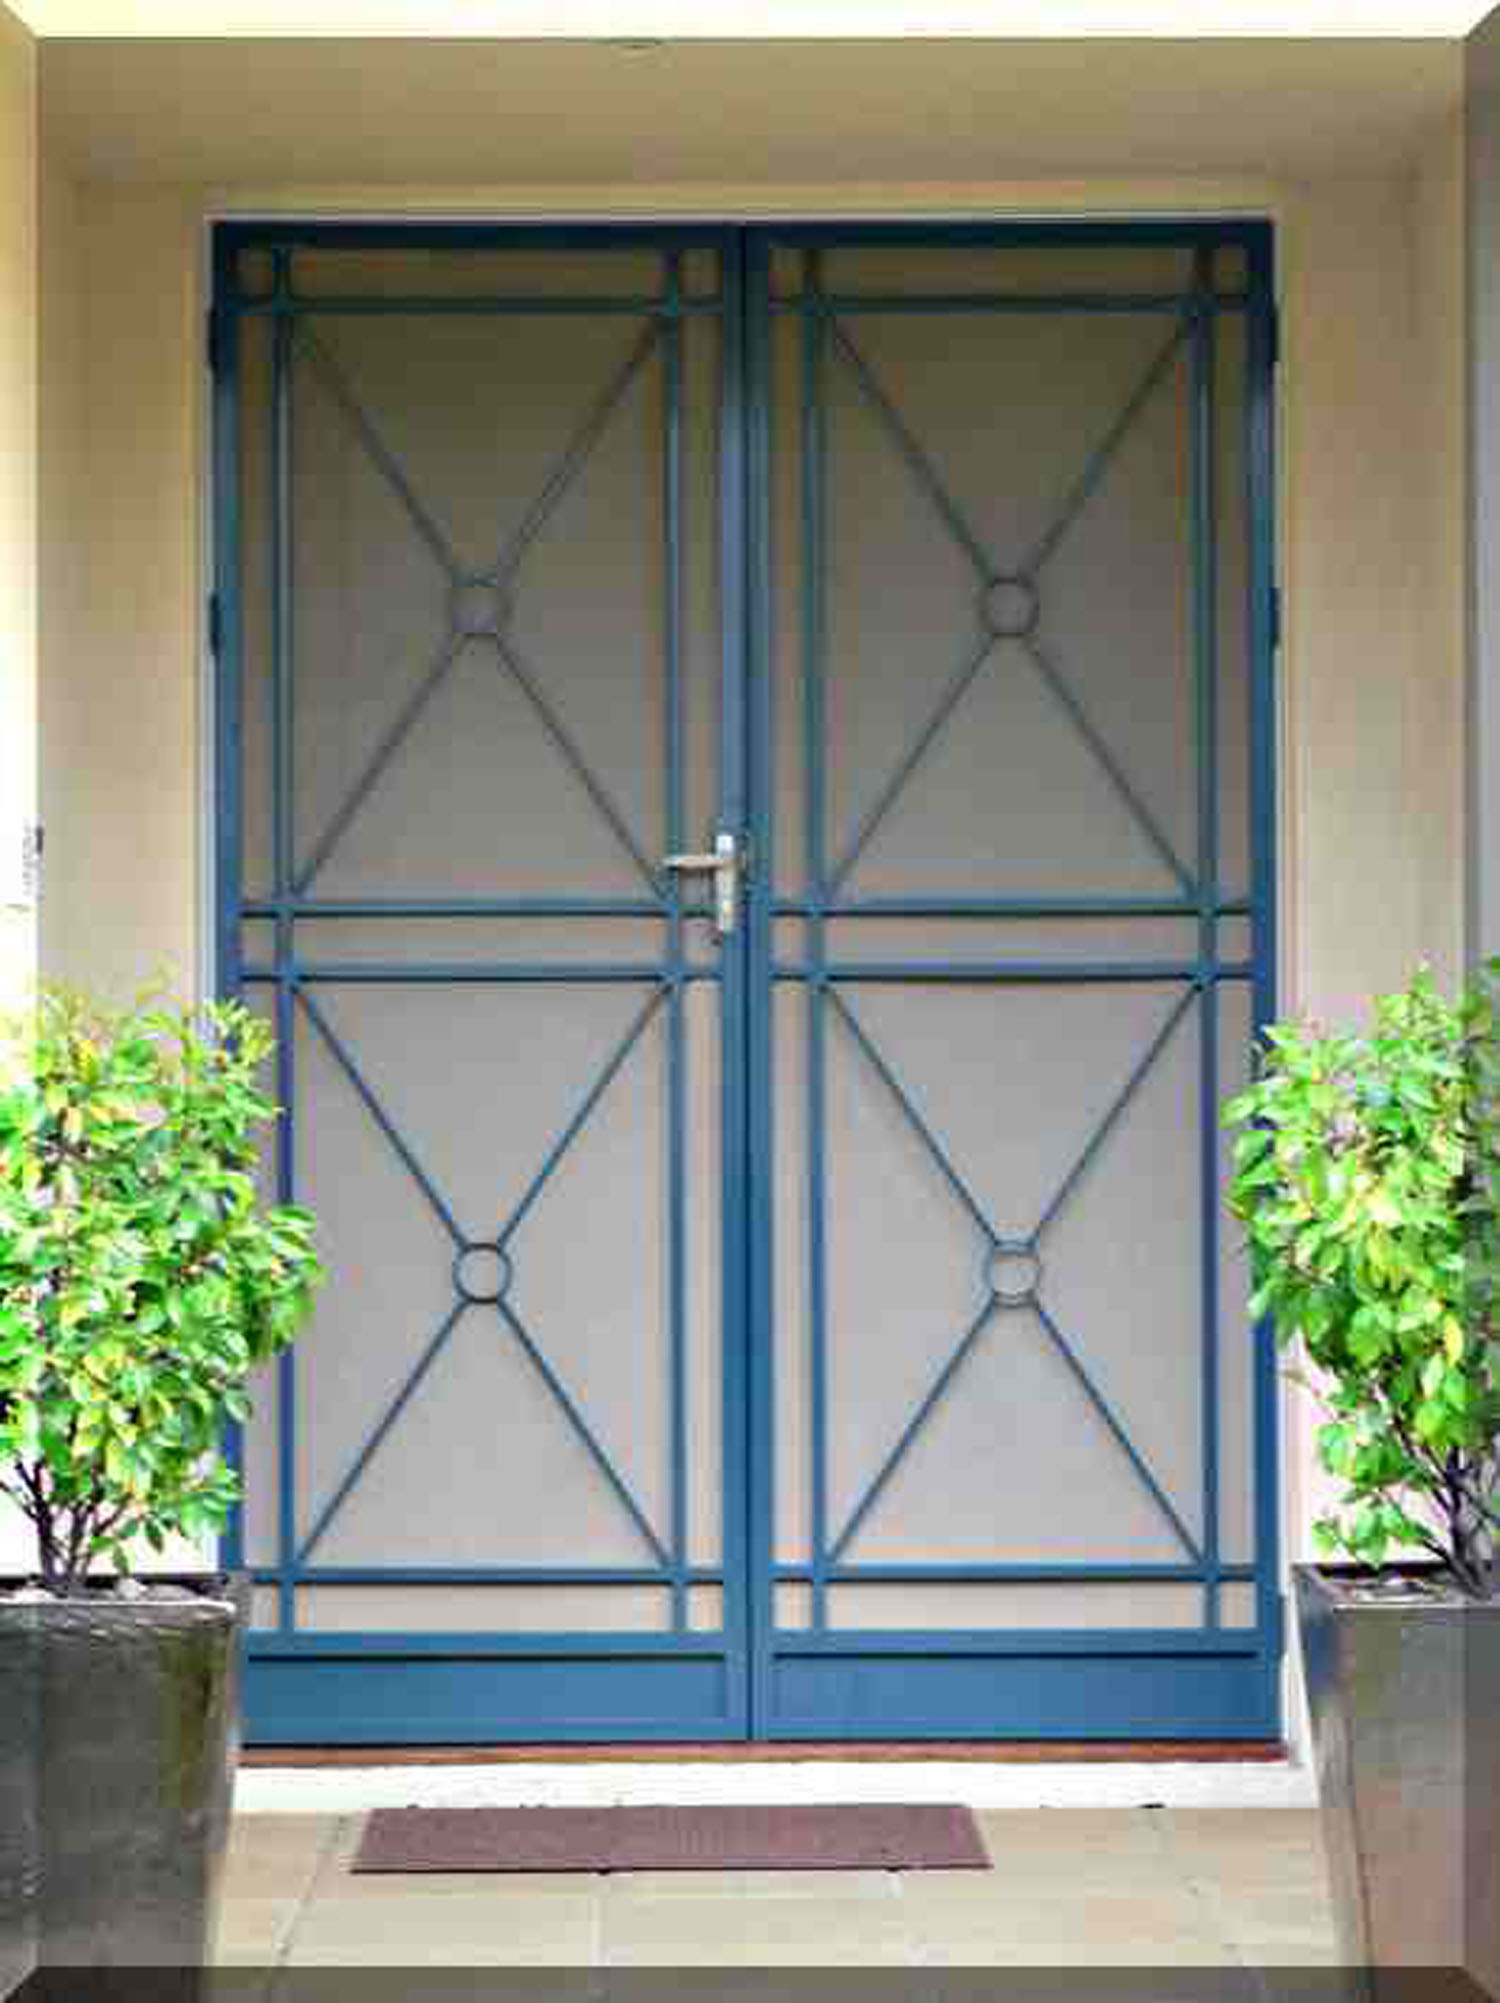 2003 #549536 Security Doors pic Residential Security Doors Exterior 41111500